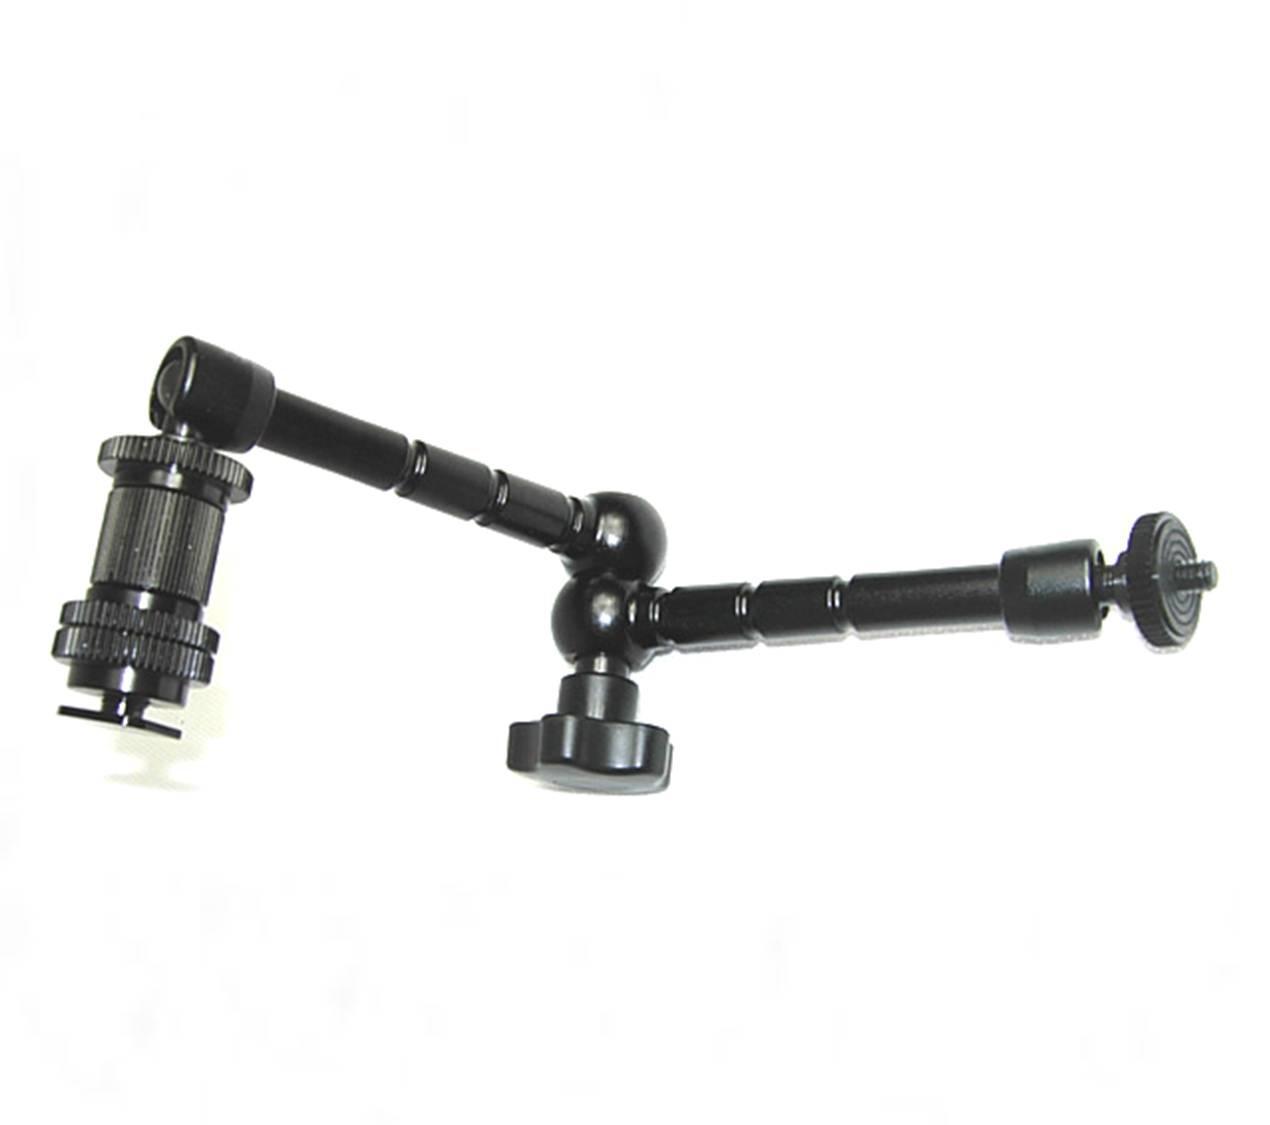 Articulating Magic Arm 11 'cal + Super Clamp do DSLR LED LED Light LCD Field Monitor